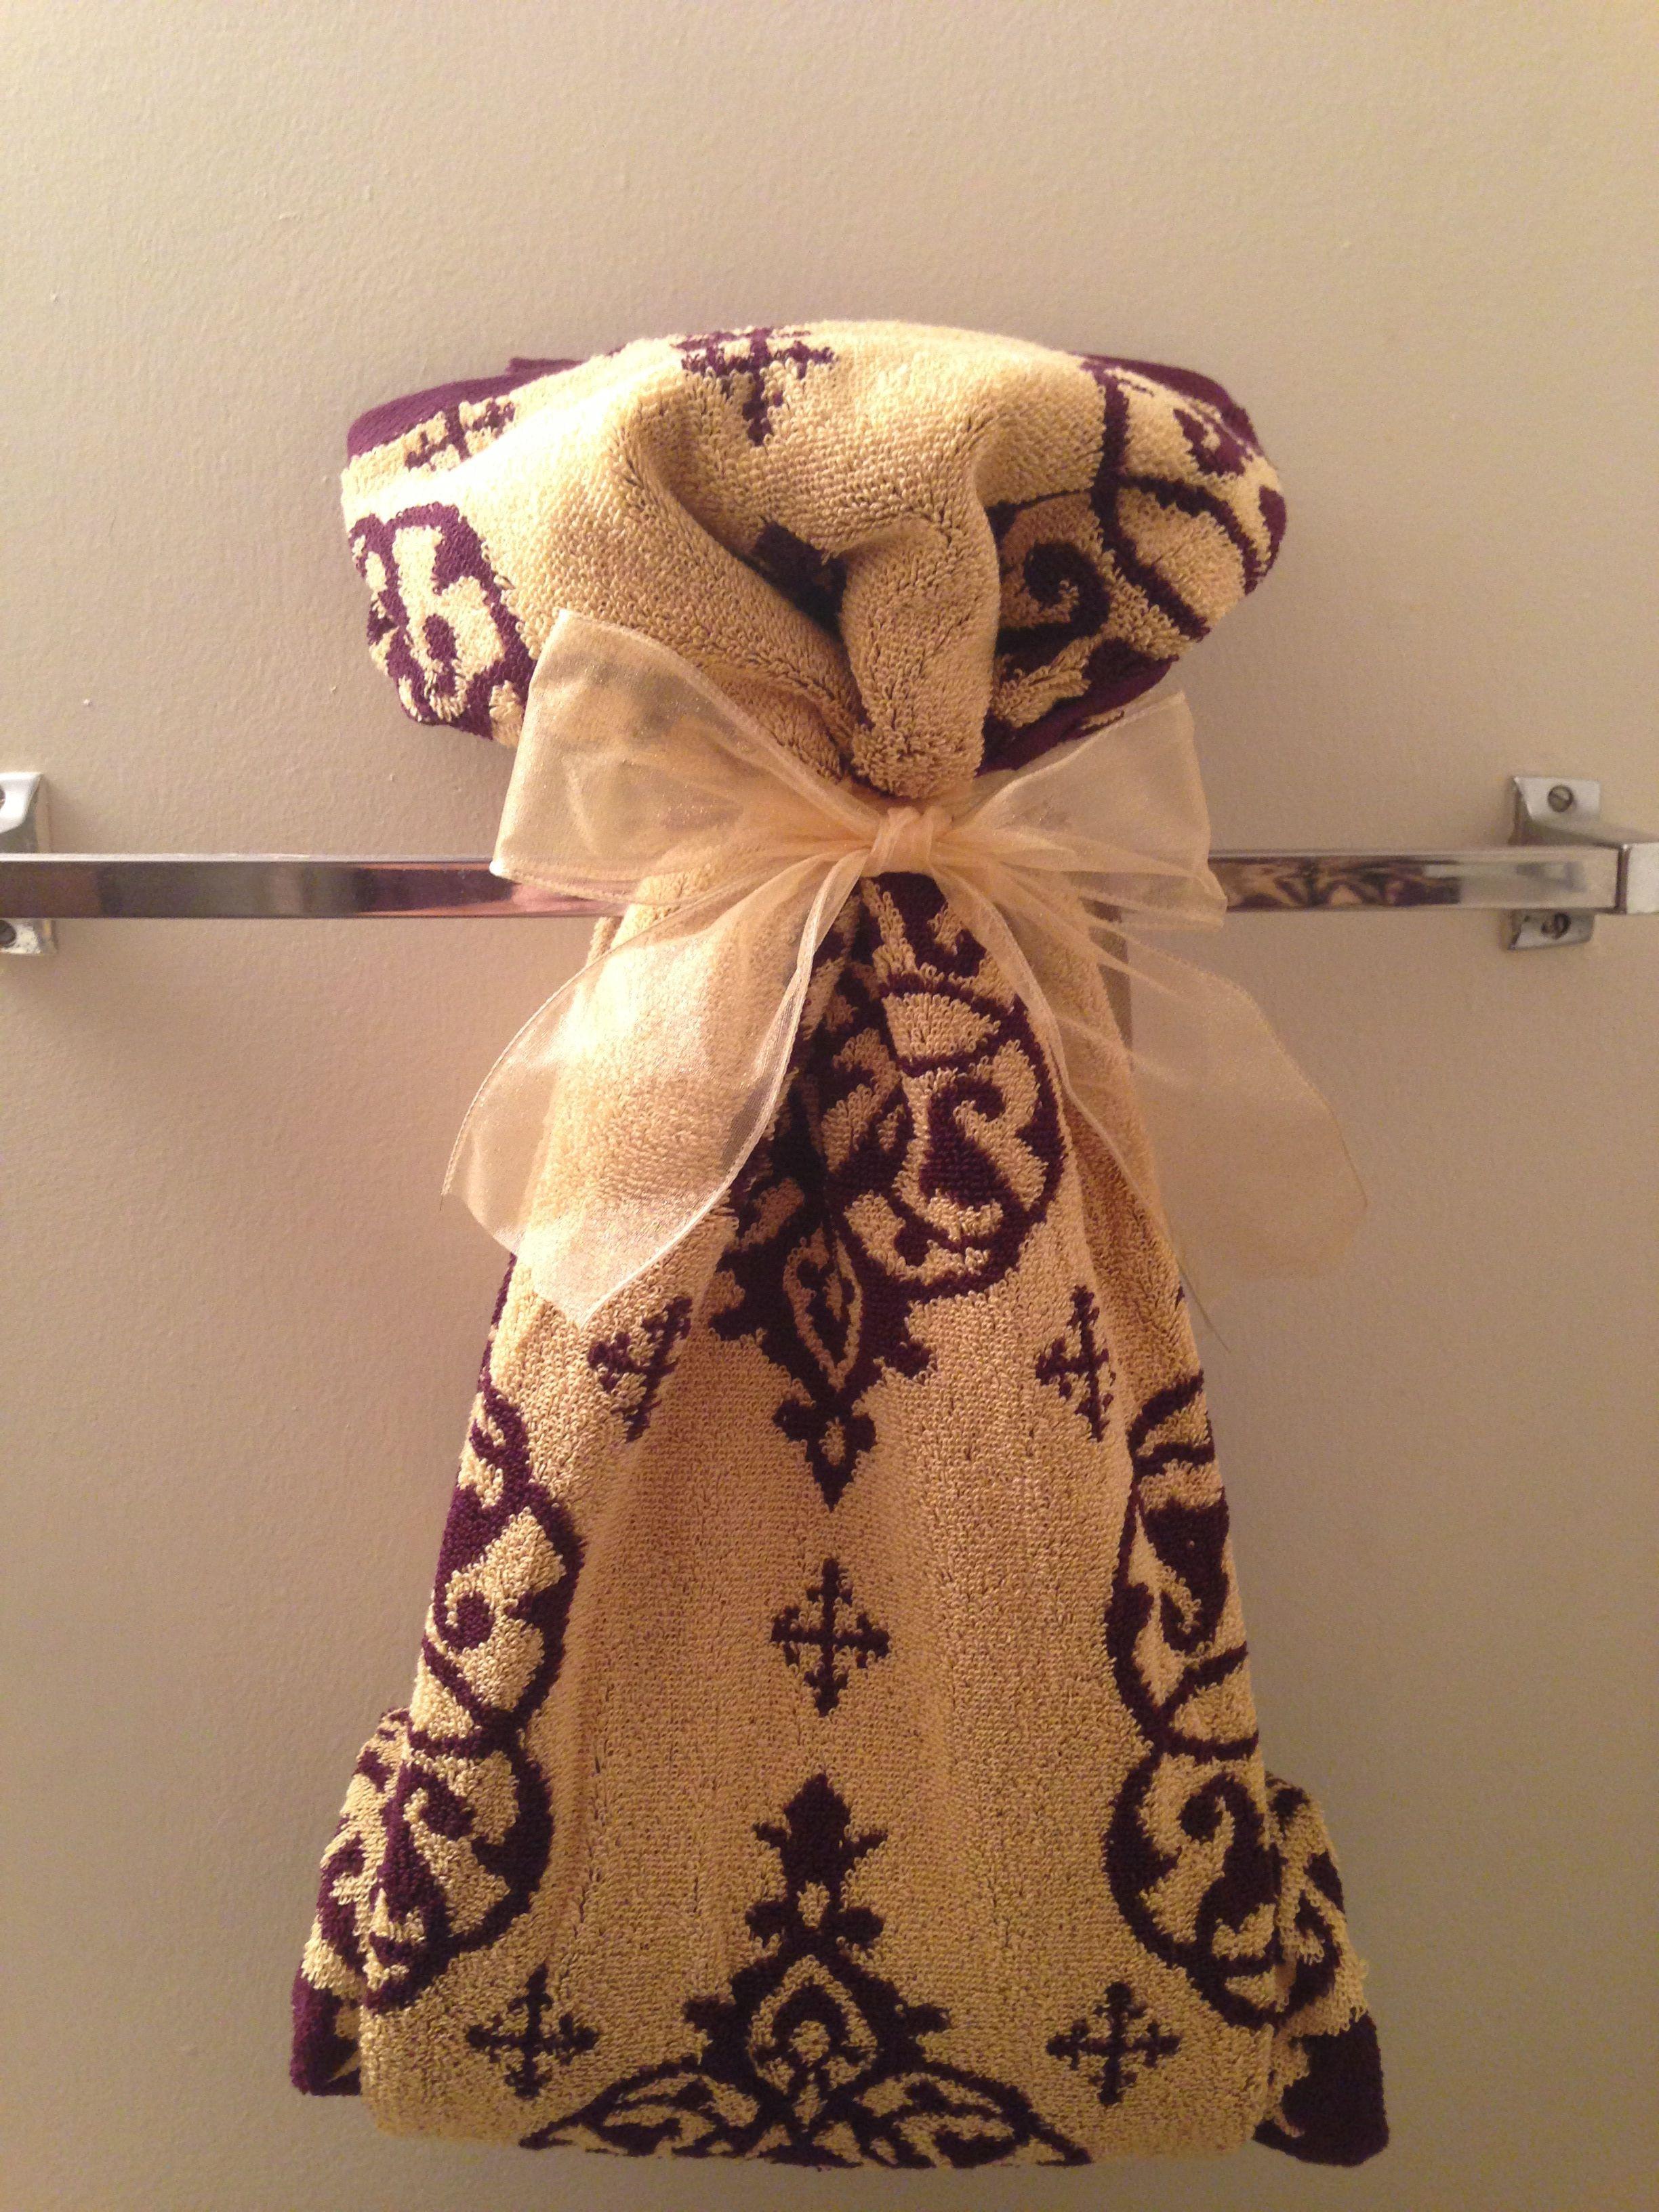 towels decor white black designs and decorative home bath bathroom